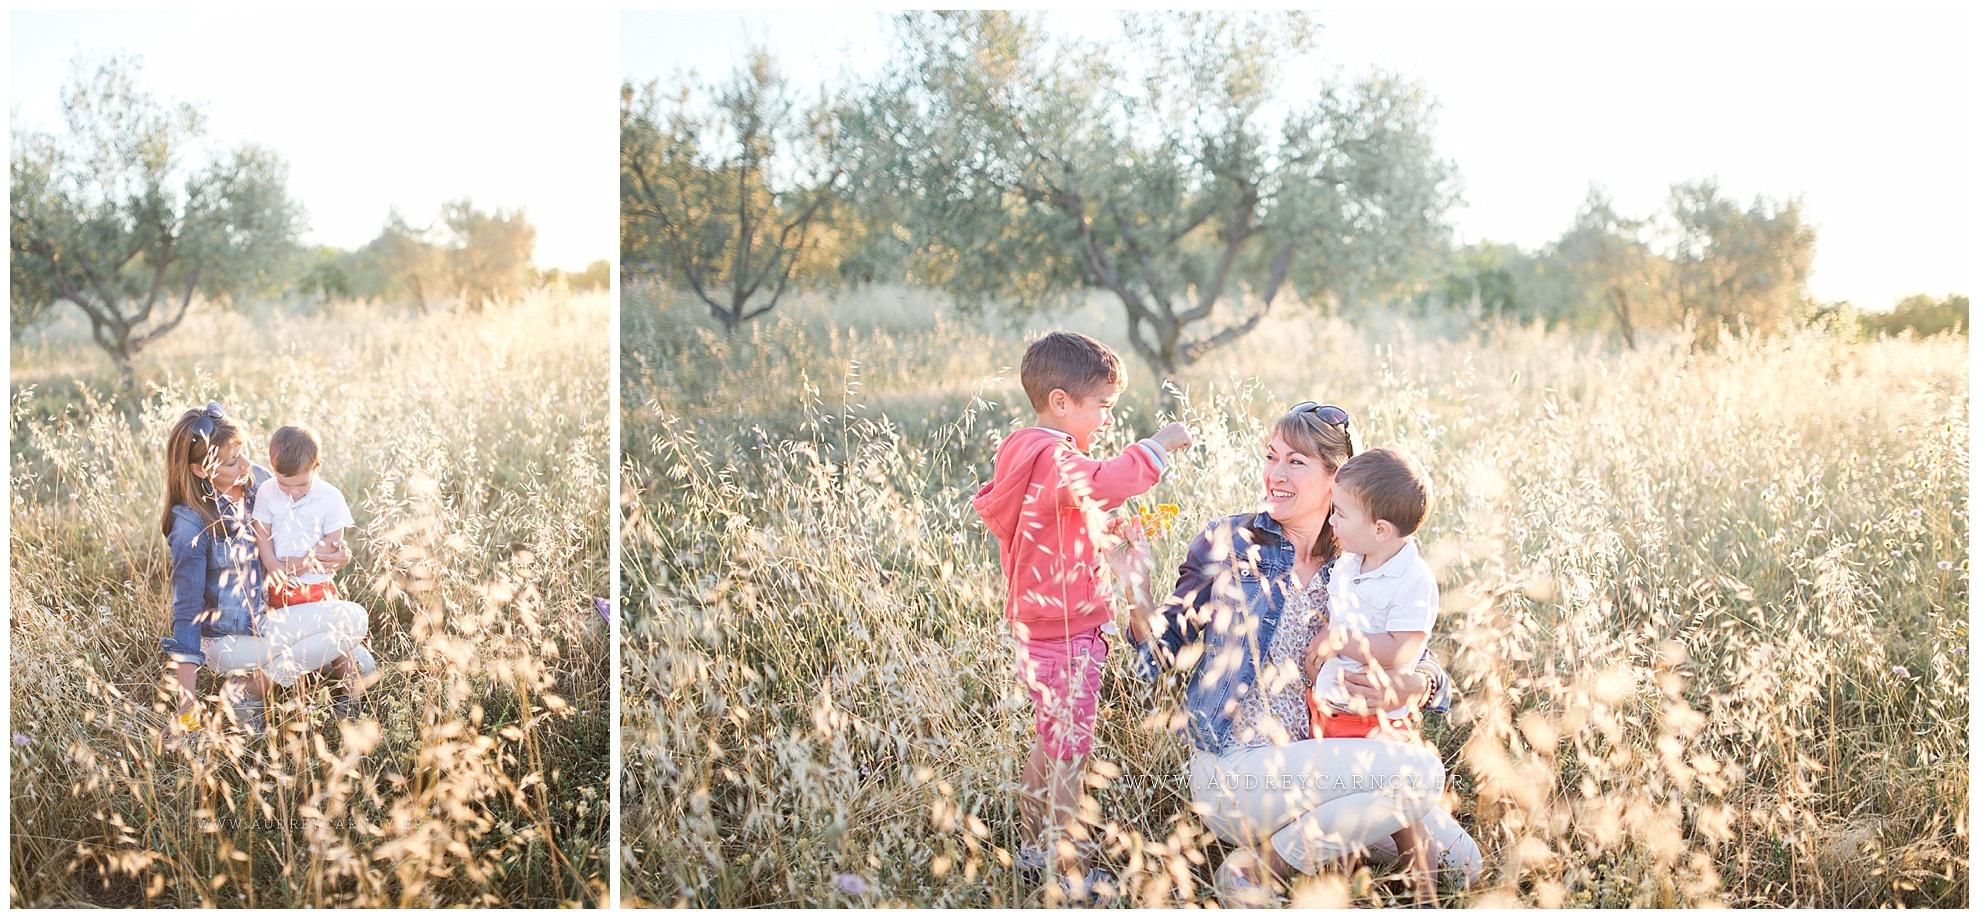 Séance famille - Valensole | Nathalie 5